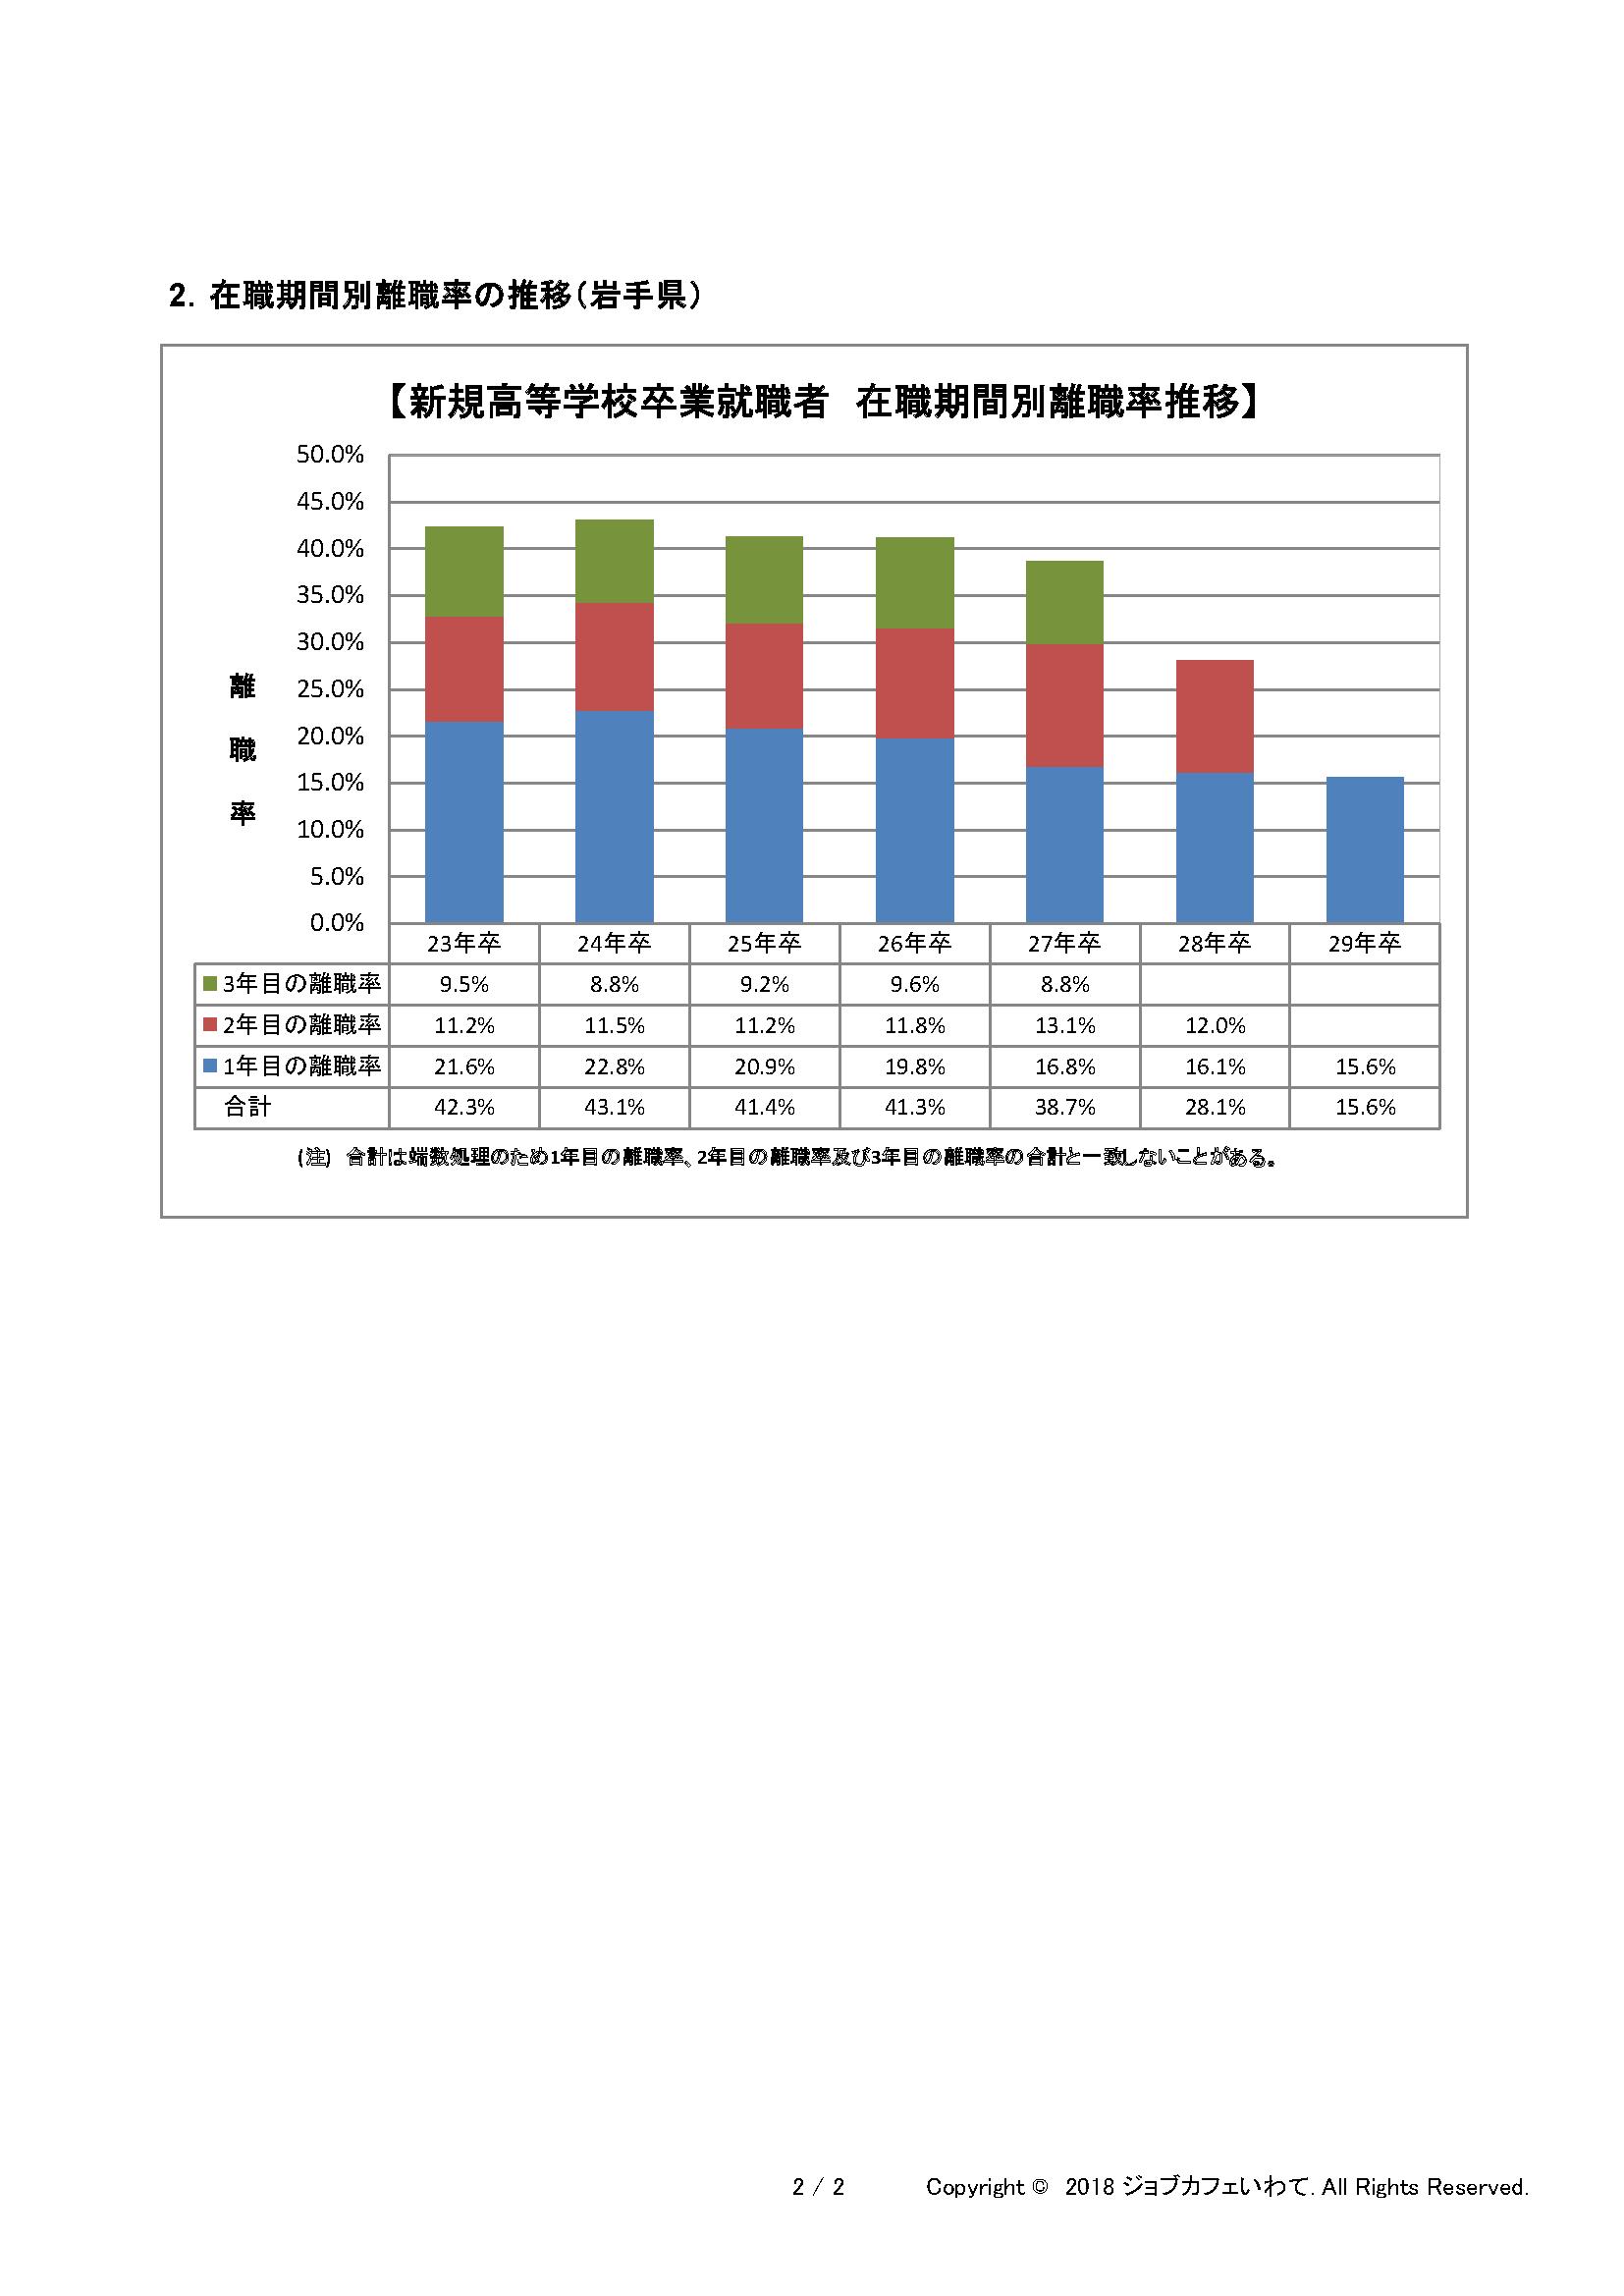 H27~29高卒者離職状況資料_ページ_2